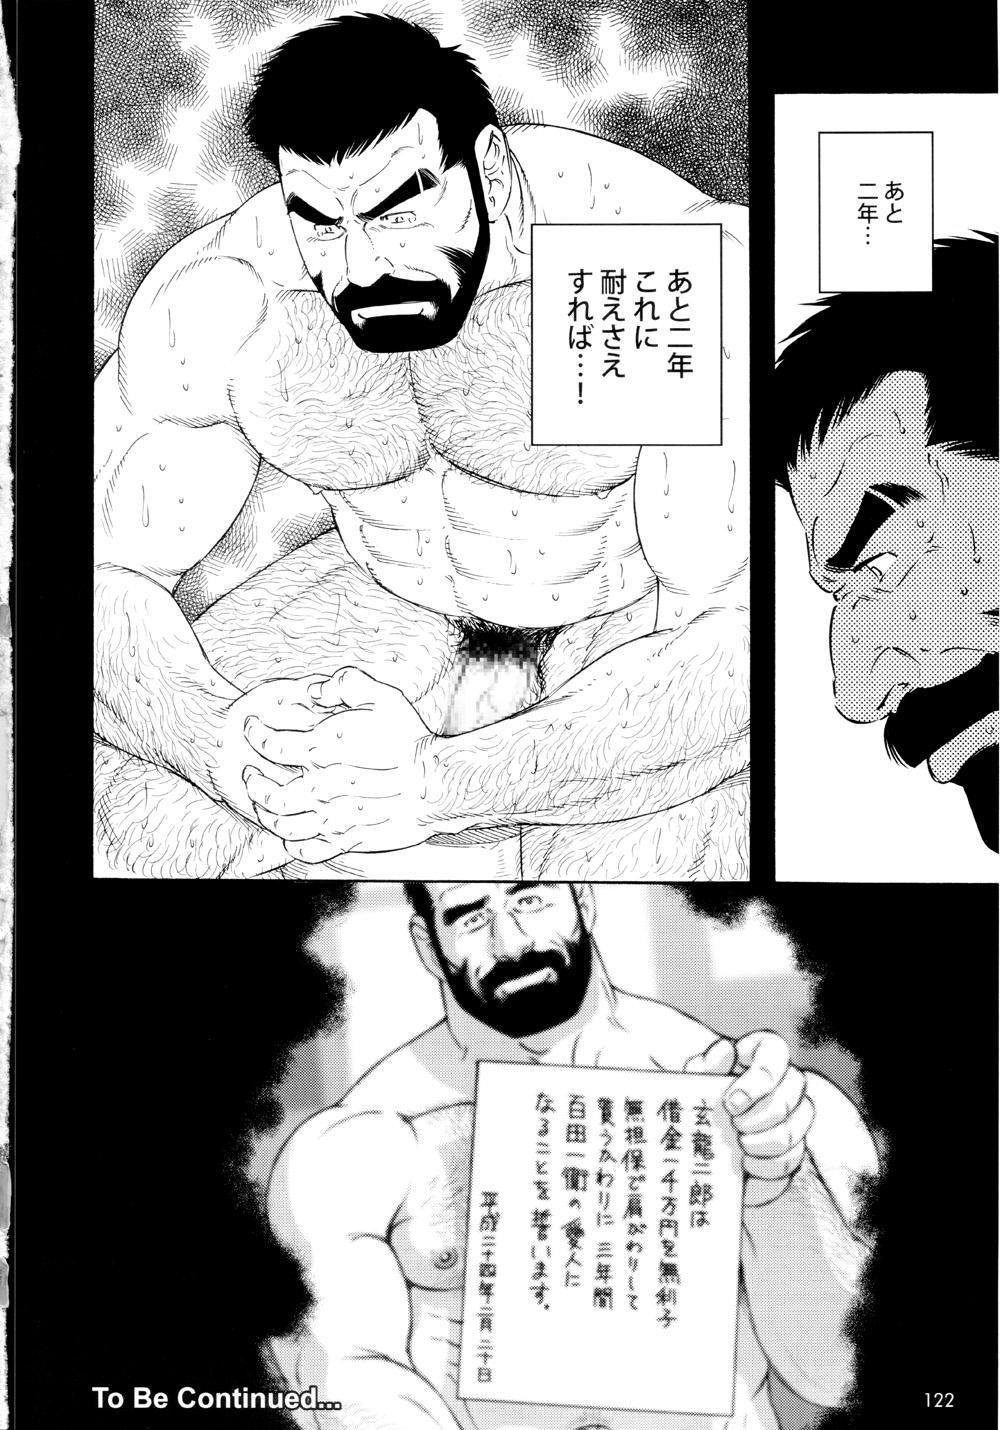 Genryu Chapter 2 15